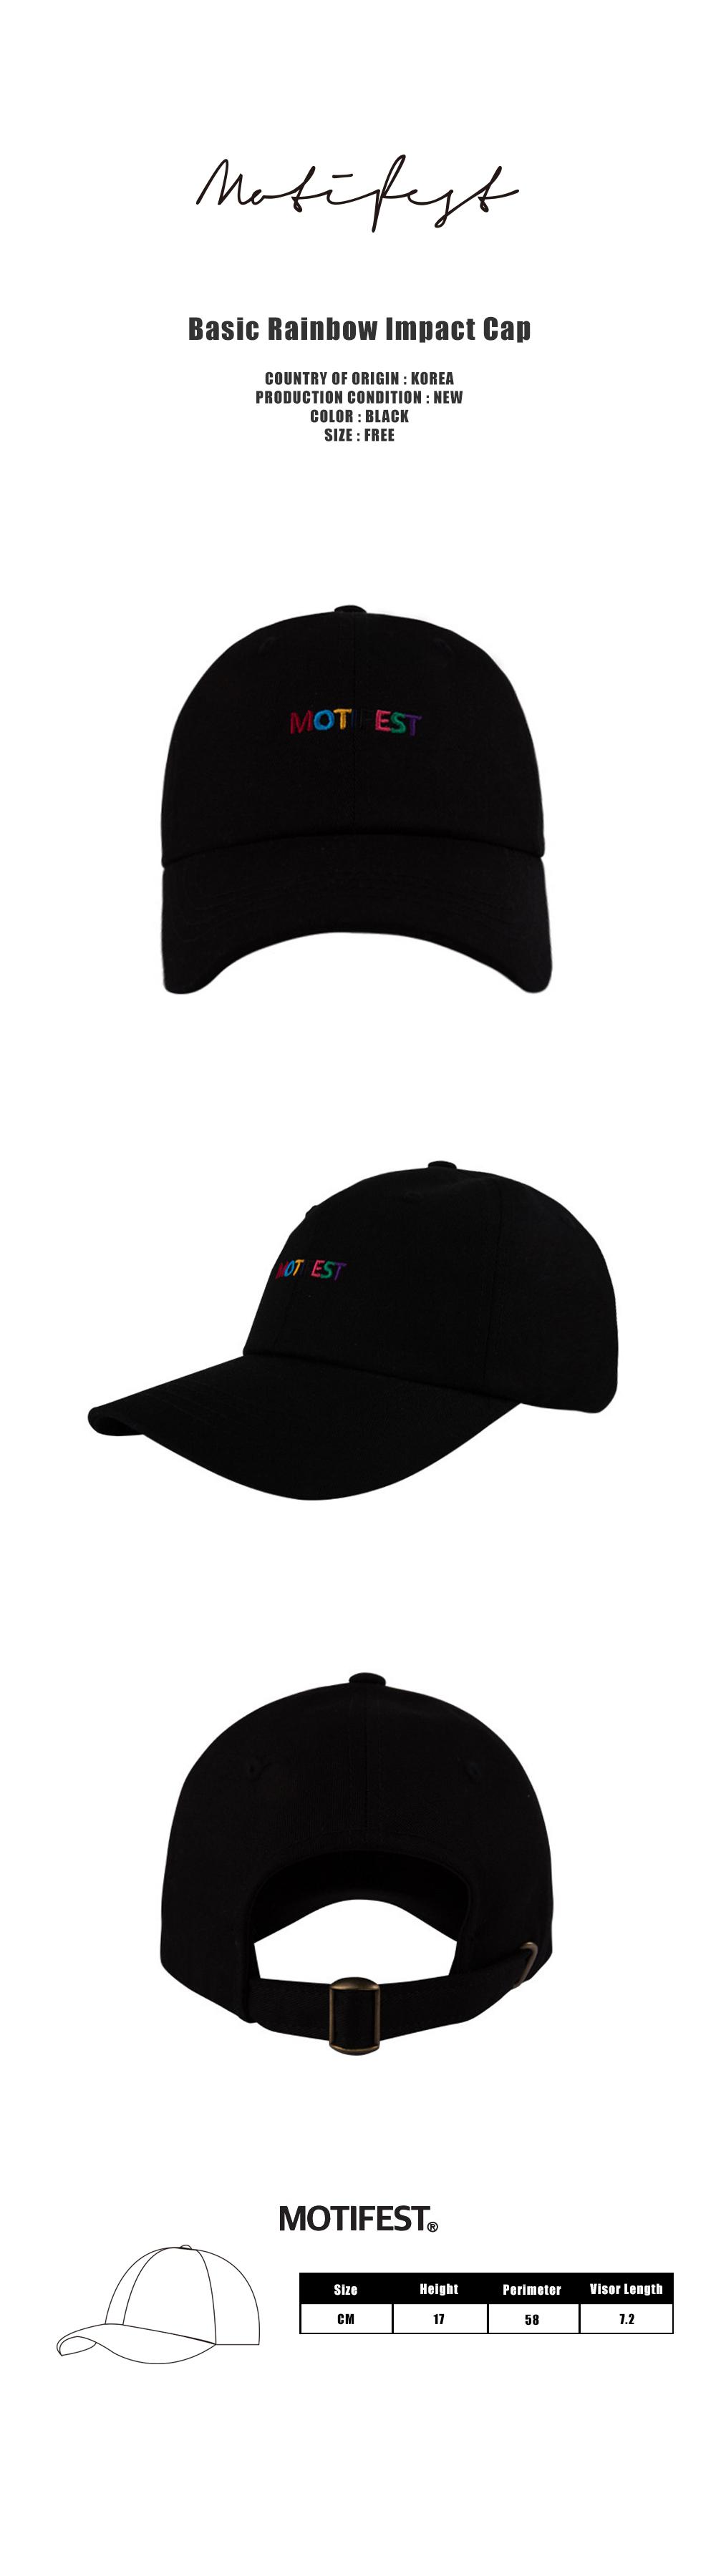 Basic Rainbow Impact Cap Black-1000.jpg